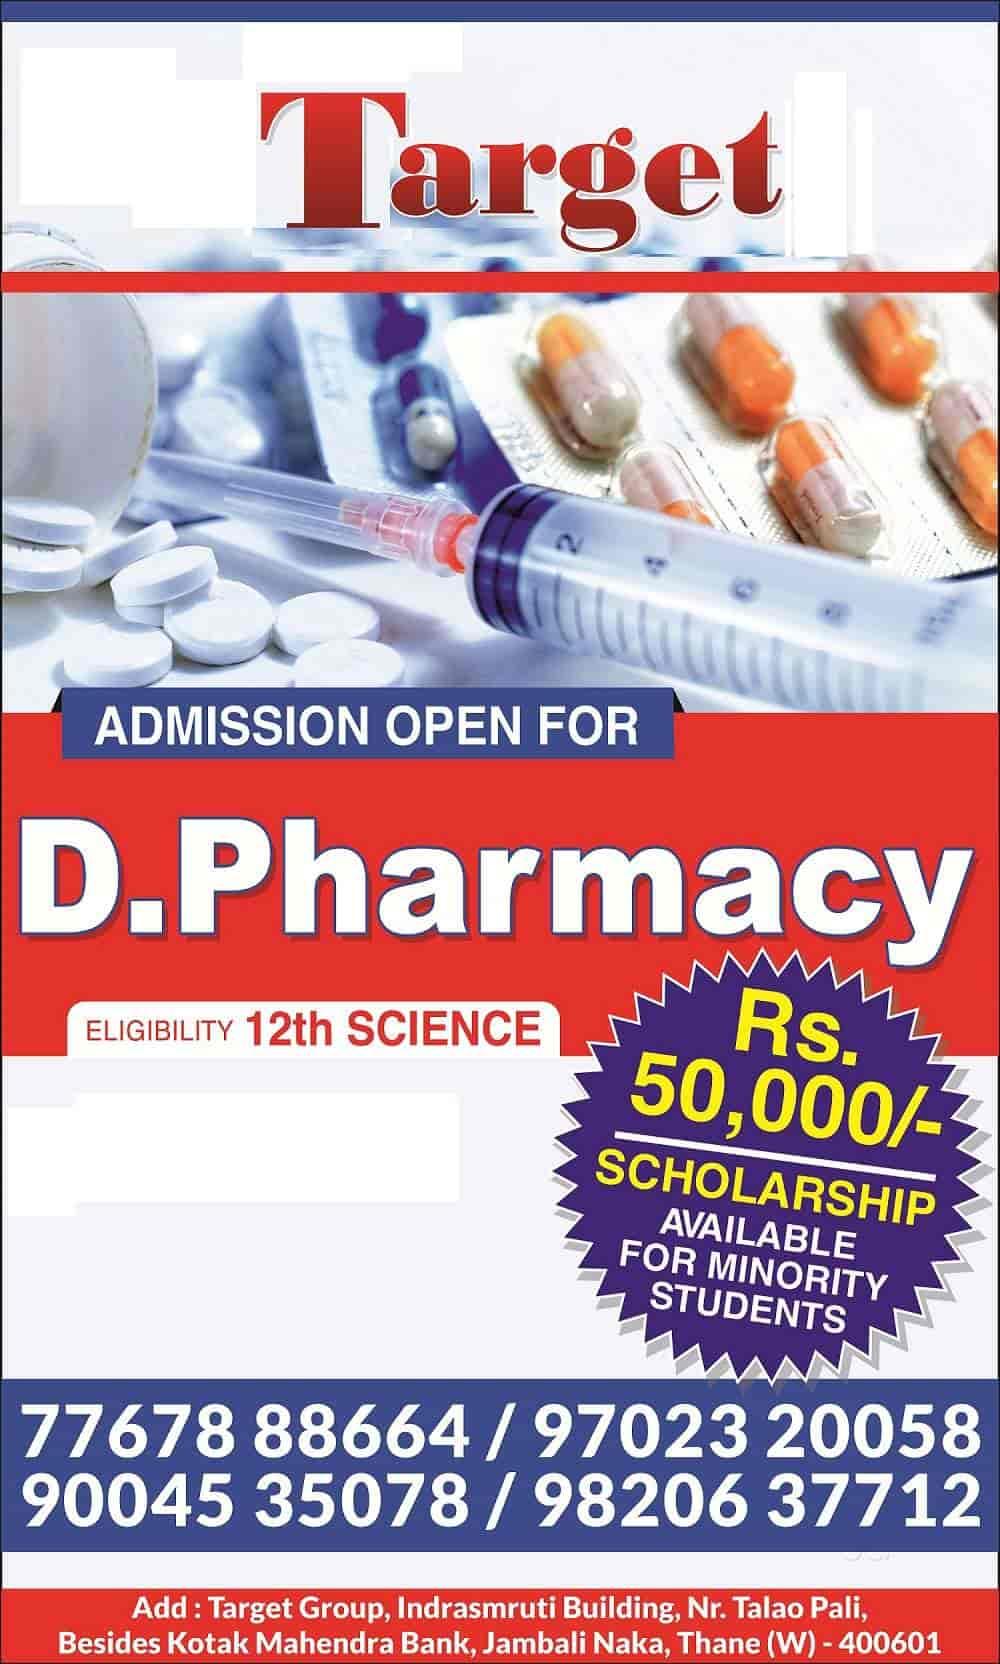 D Pharmacy Book